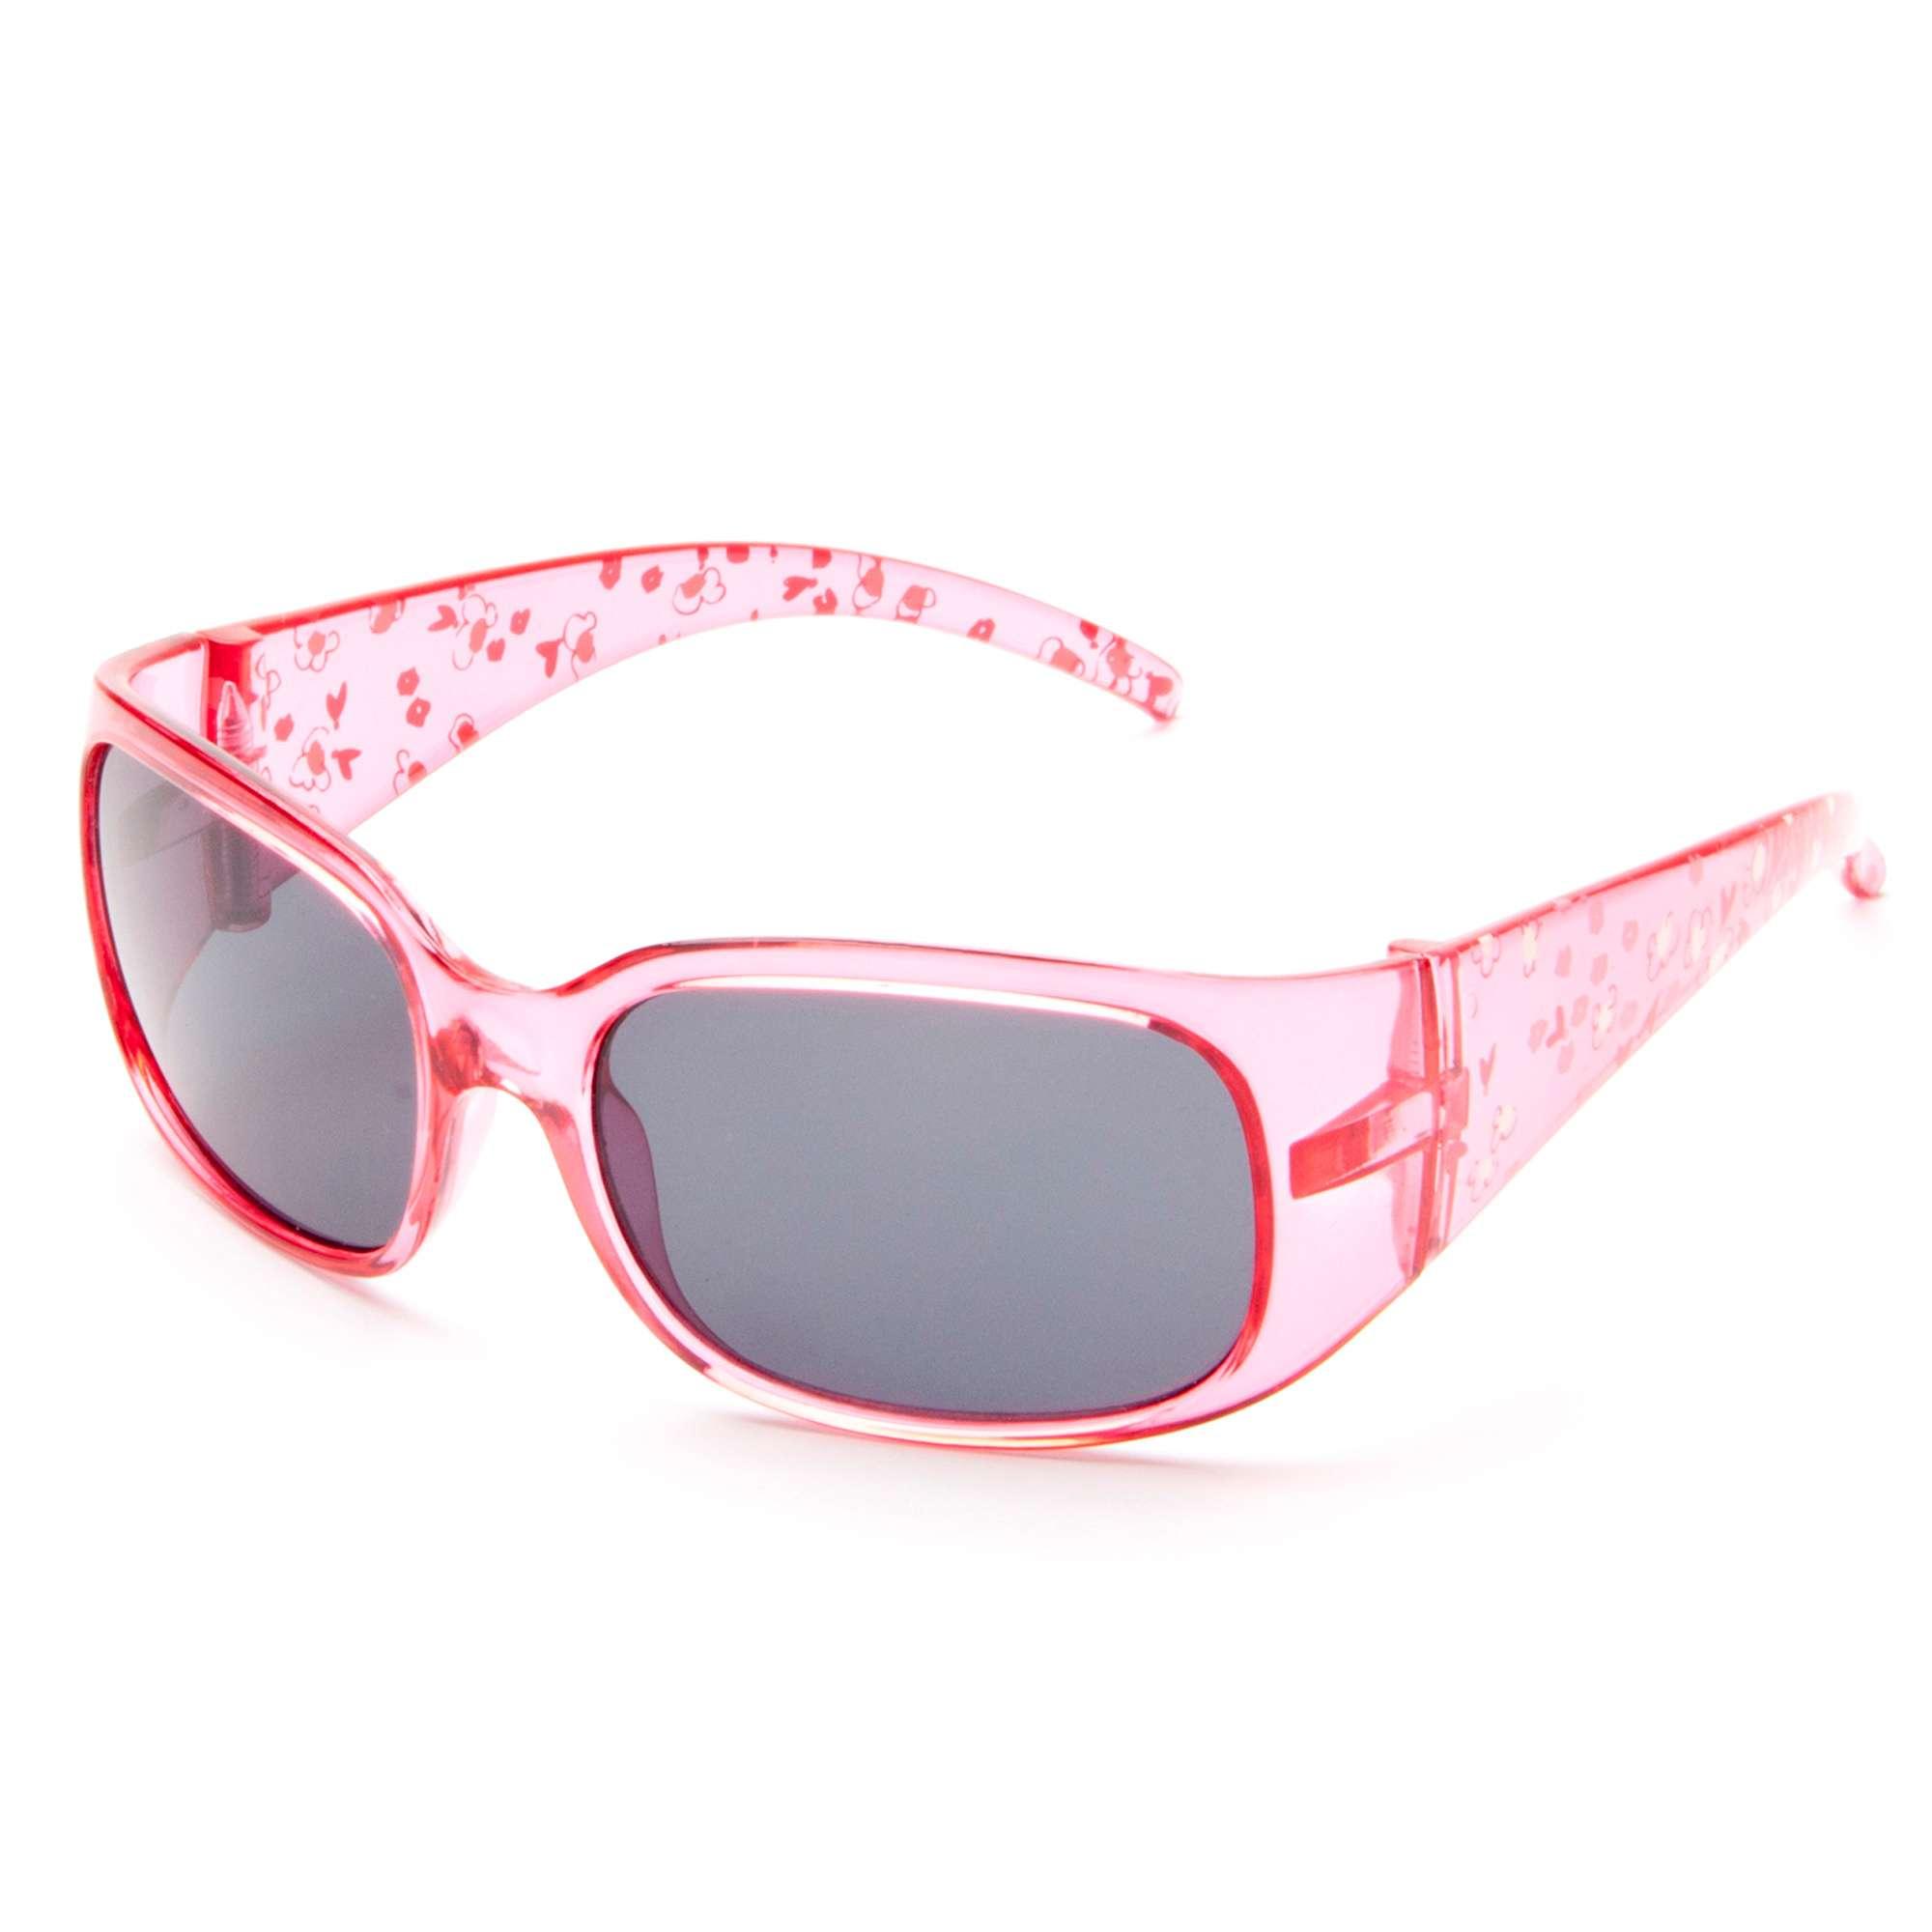 PETER STORM Girl's FF Heart Sunglasses